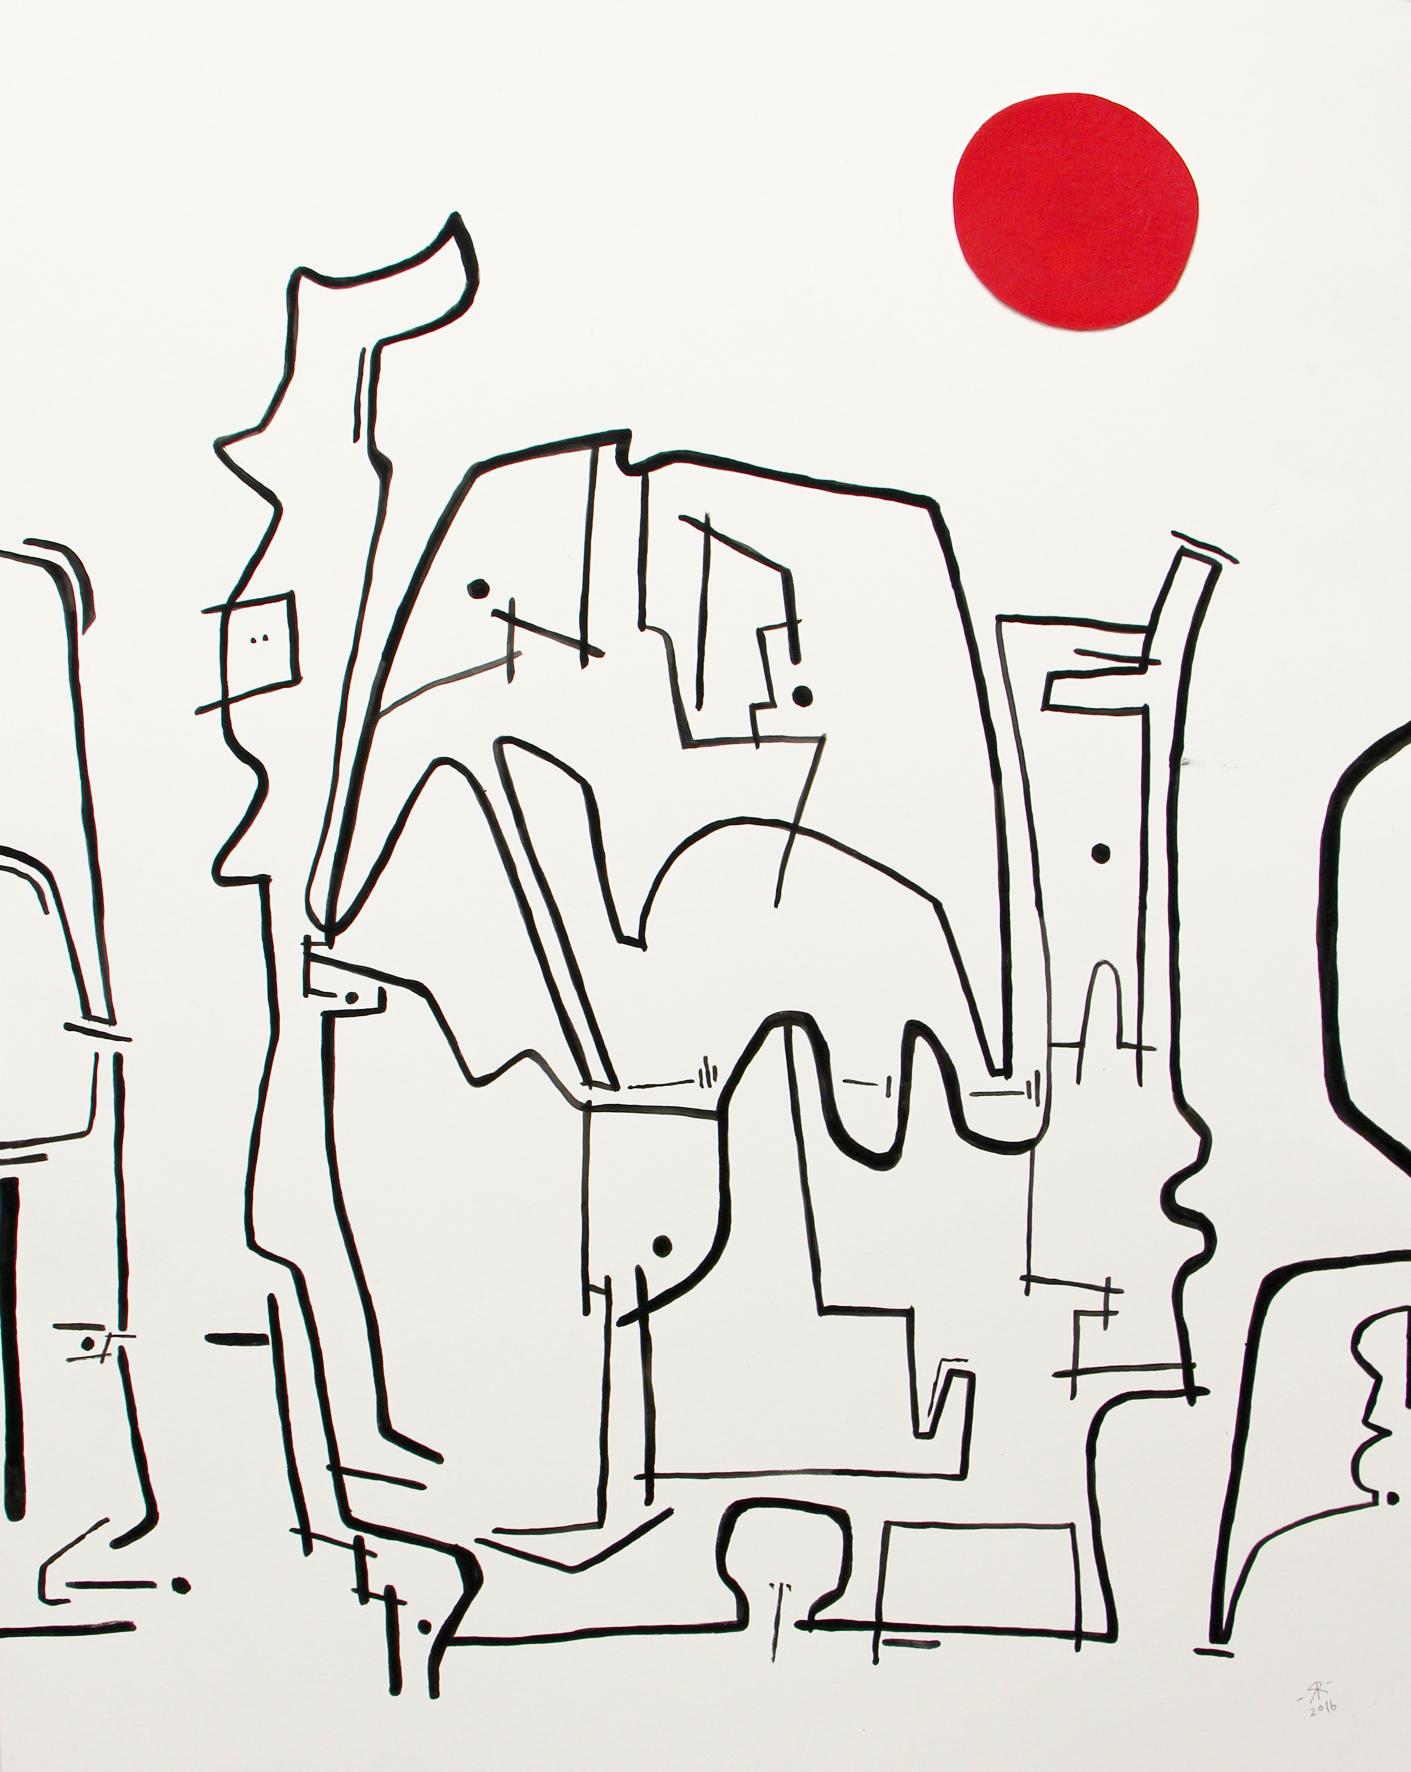 Renée Rossouw The Elephant Faces Mixed Media 53.5 x 41.5 cm R3 800